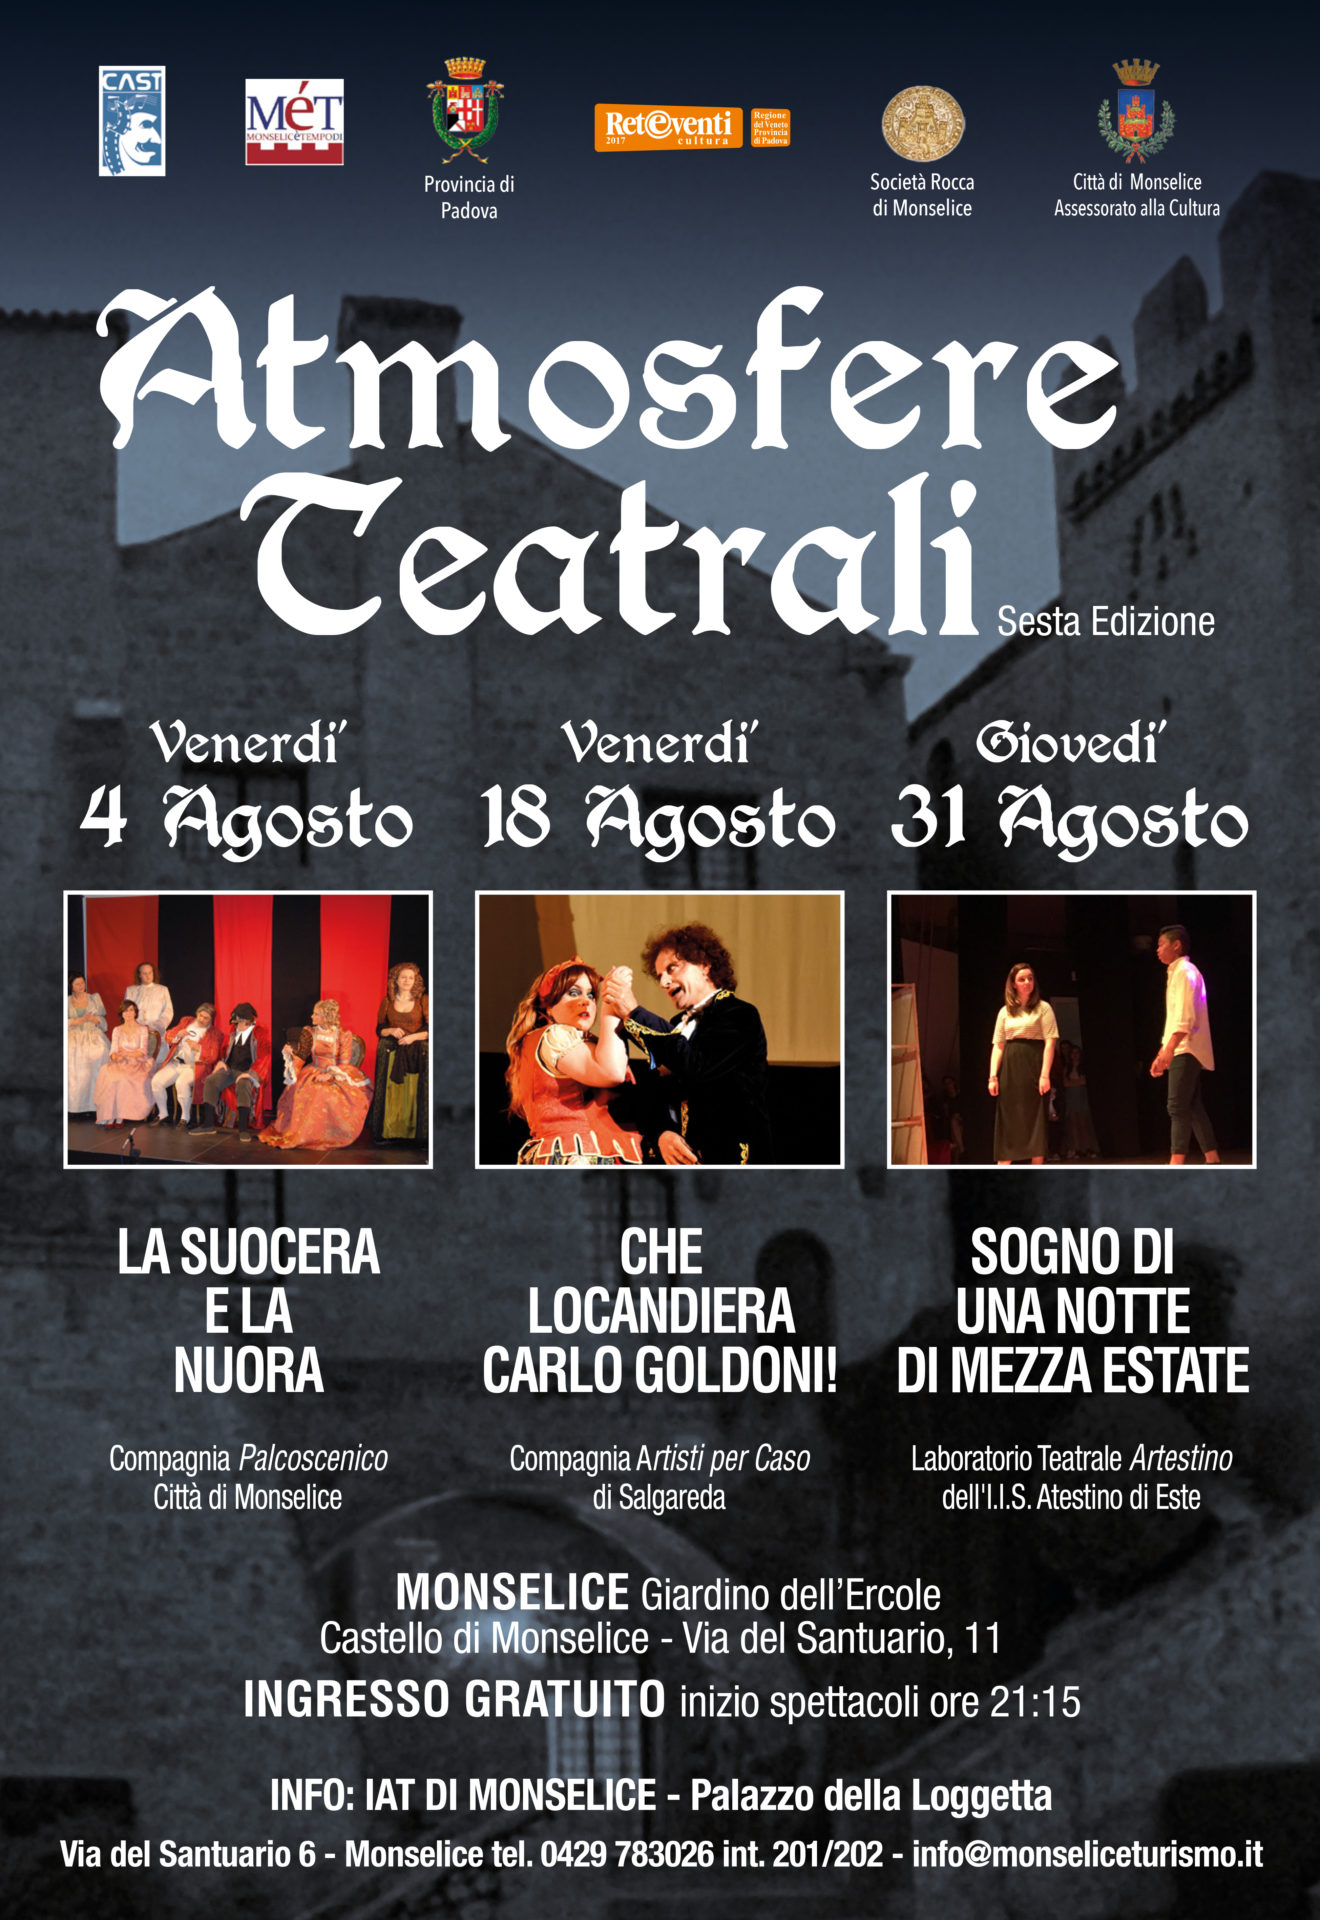 Atmosfere Teatrali 2017